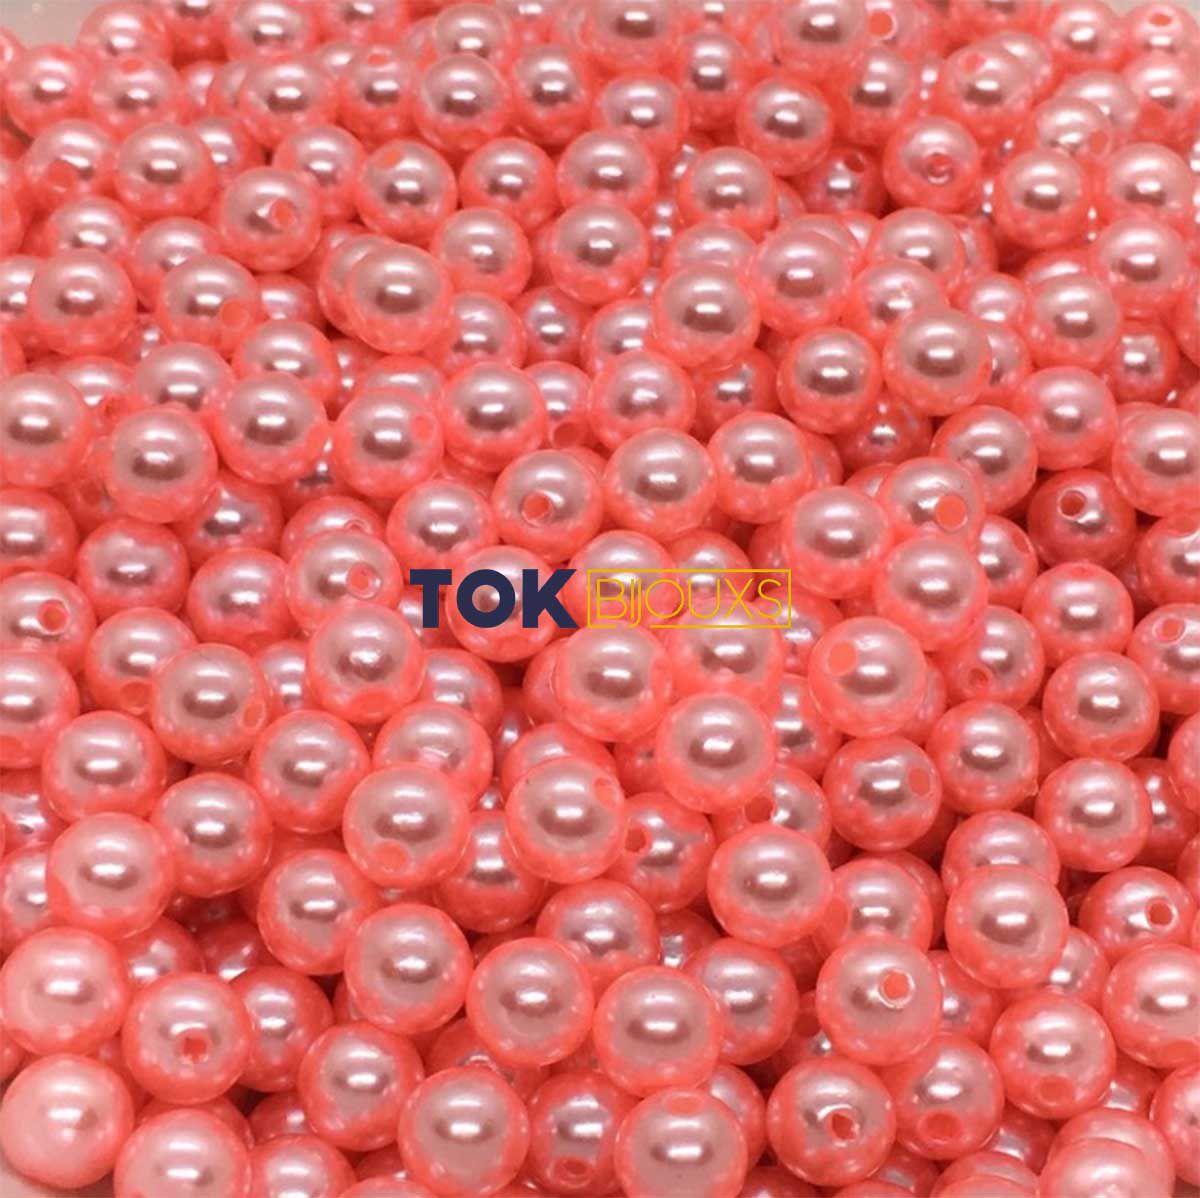 Atacado - Pérola Redonda 8mm - Rosa Chiclete - 500g